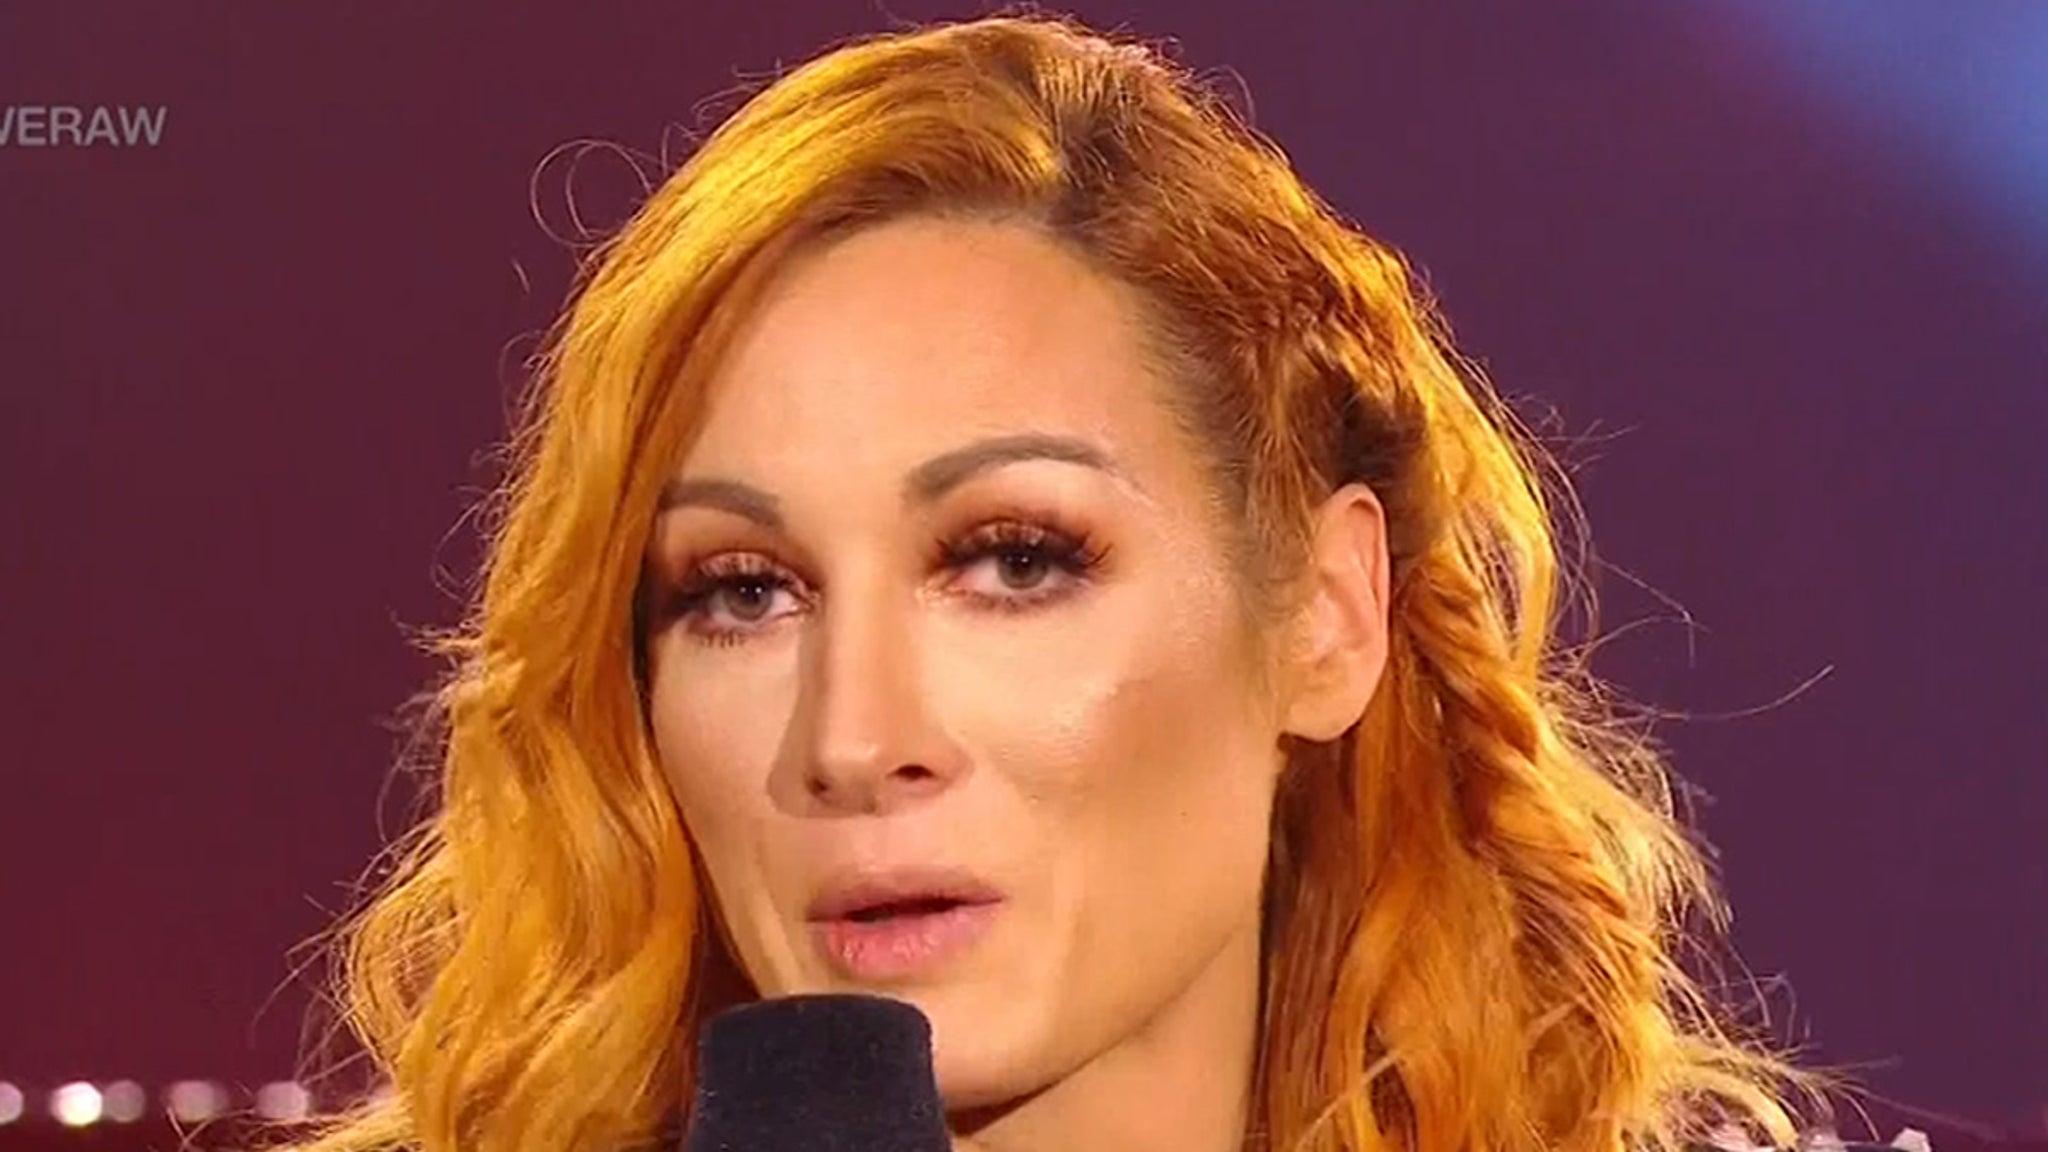 WWE Superstar Becky Lynch Announces Pregnancy On Monday Night Raw